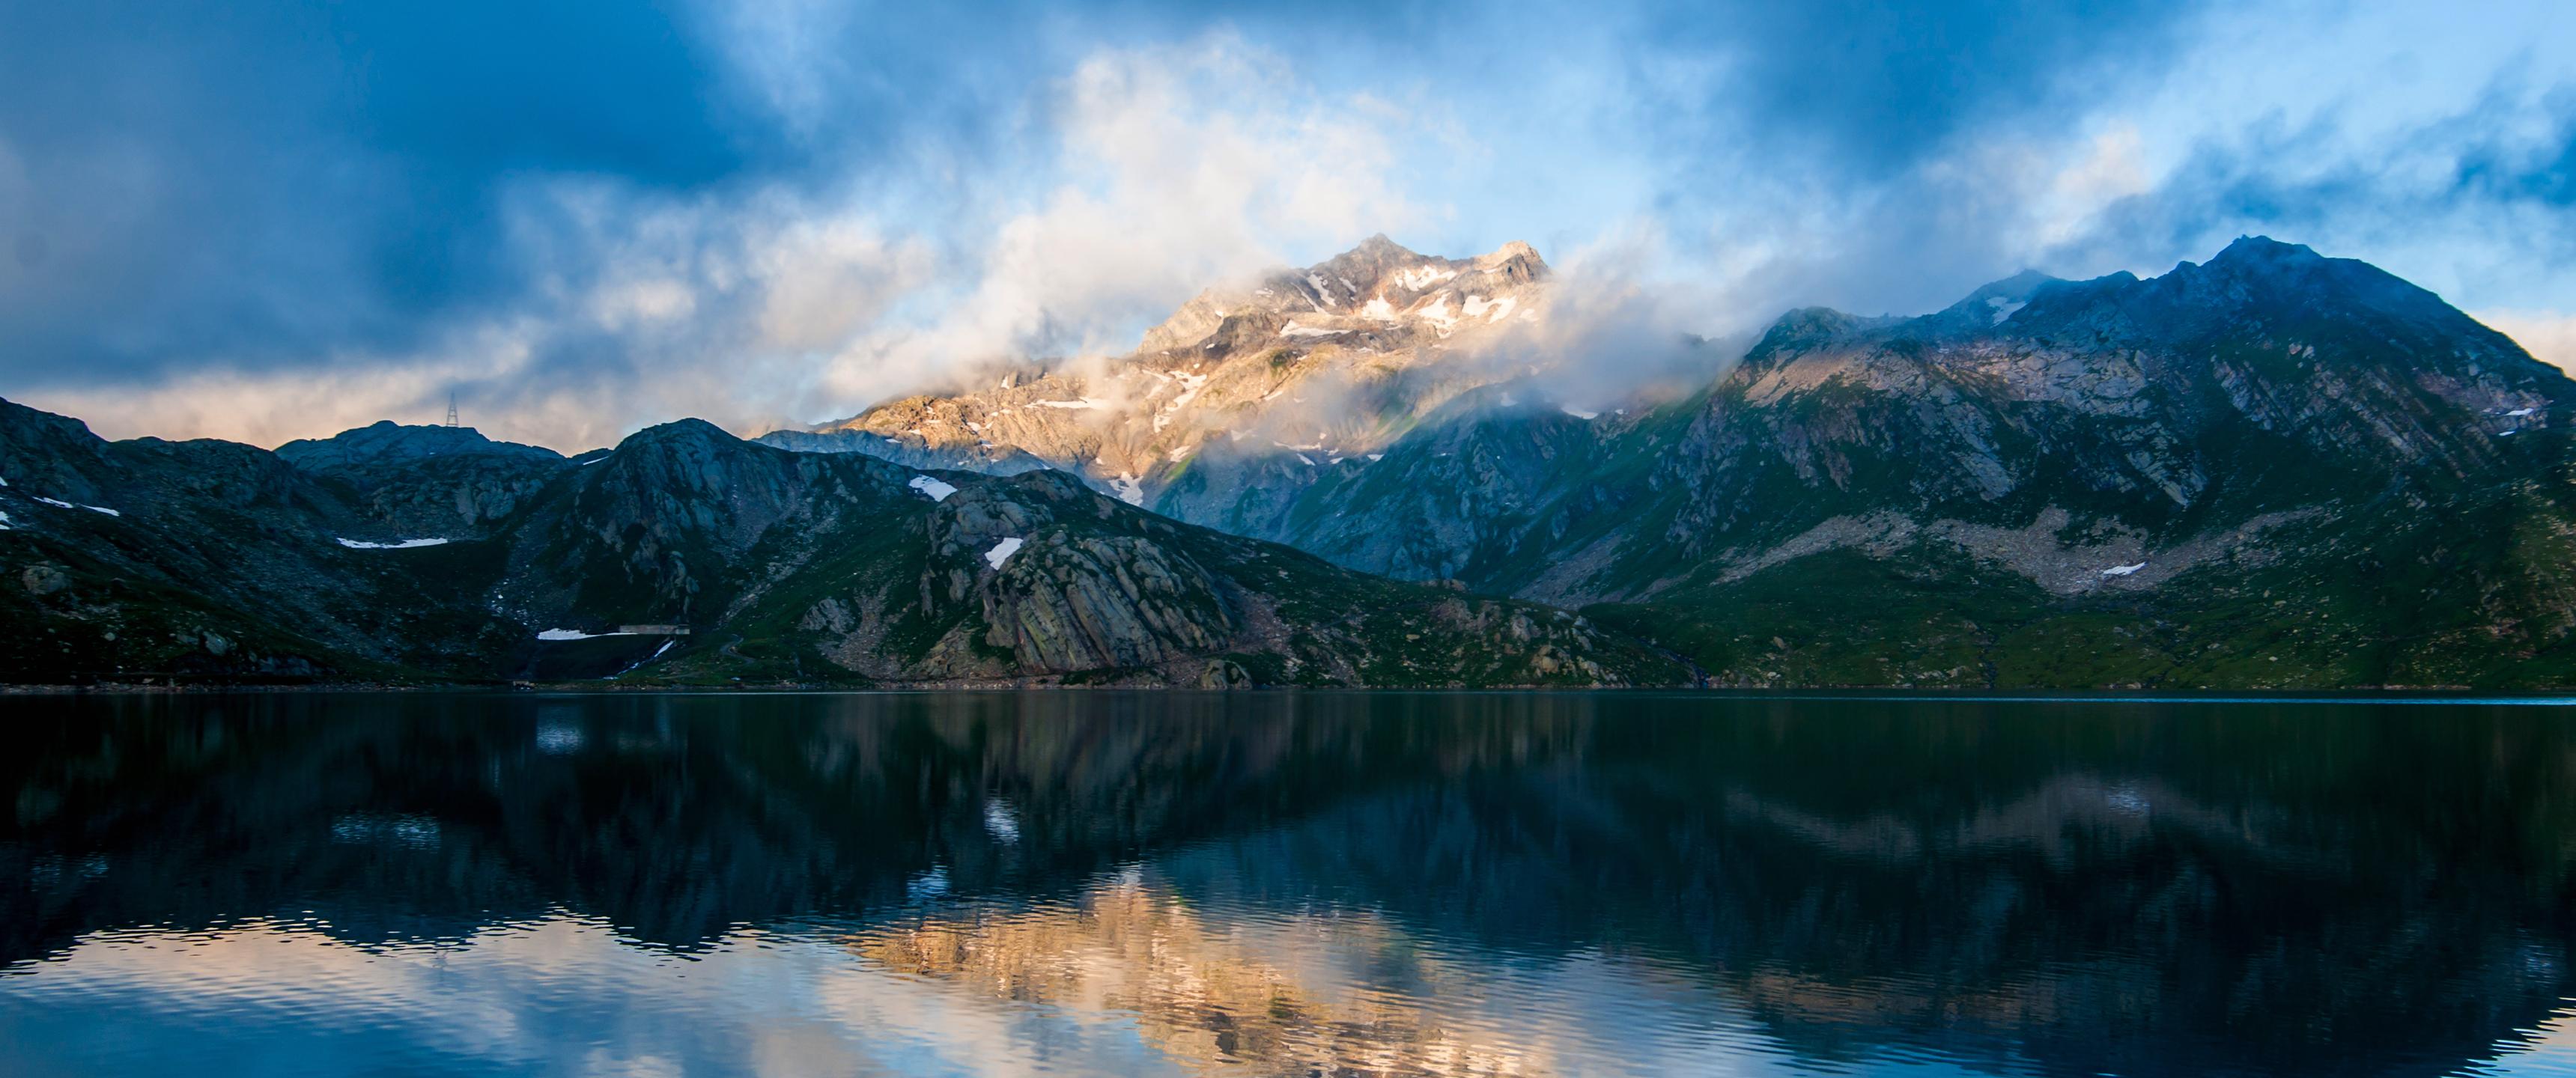 Reflecting Mountain 219 Wallpaper